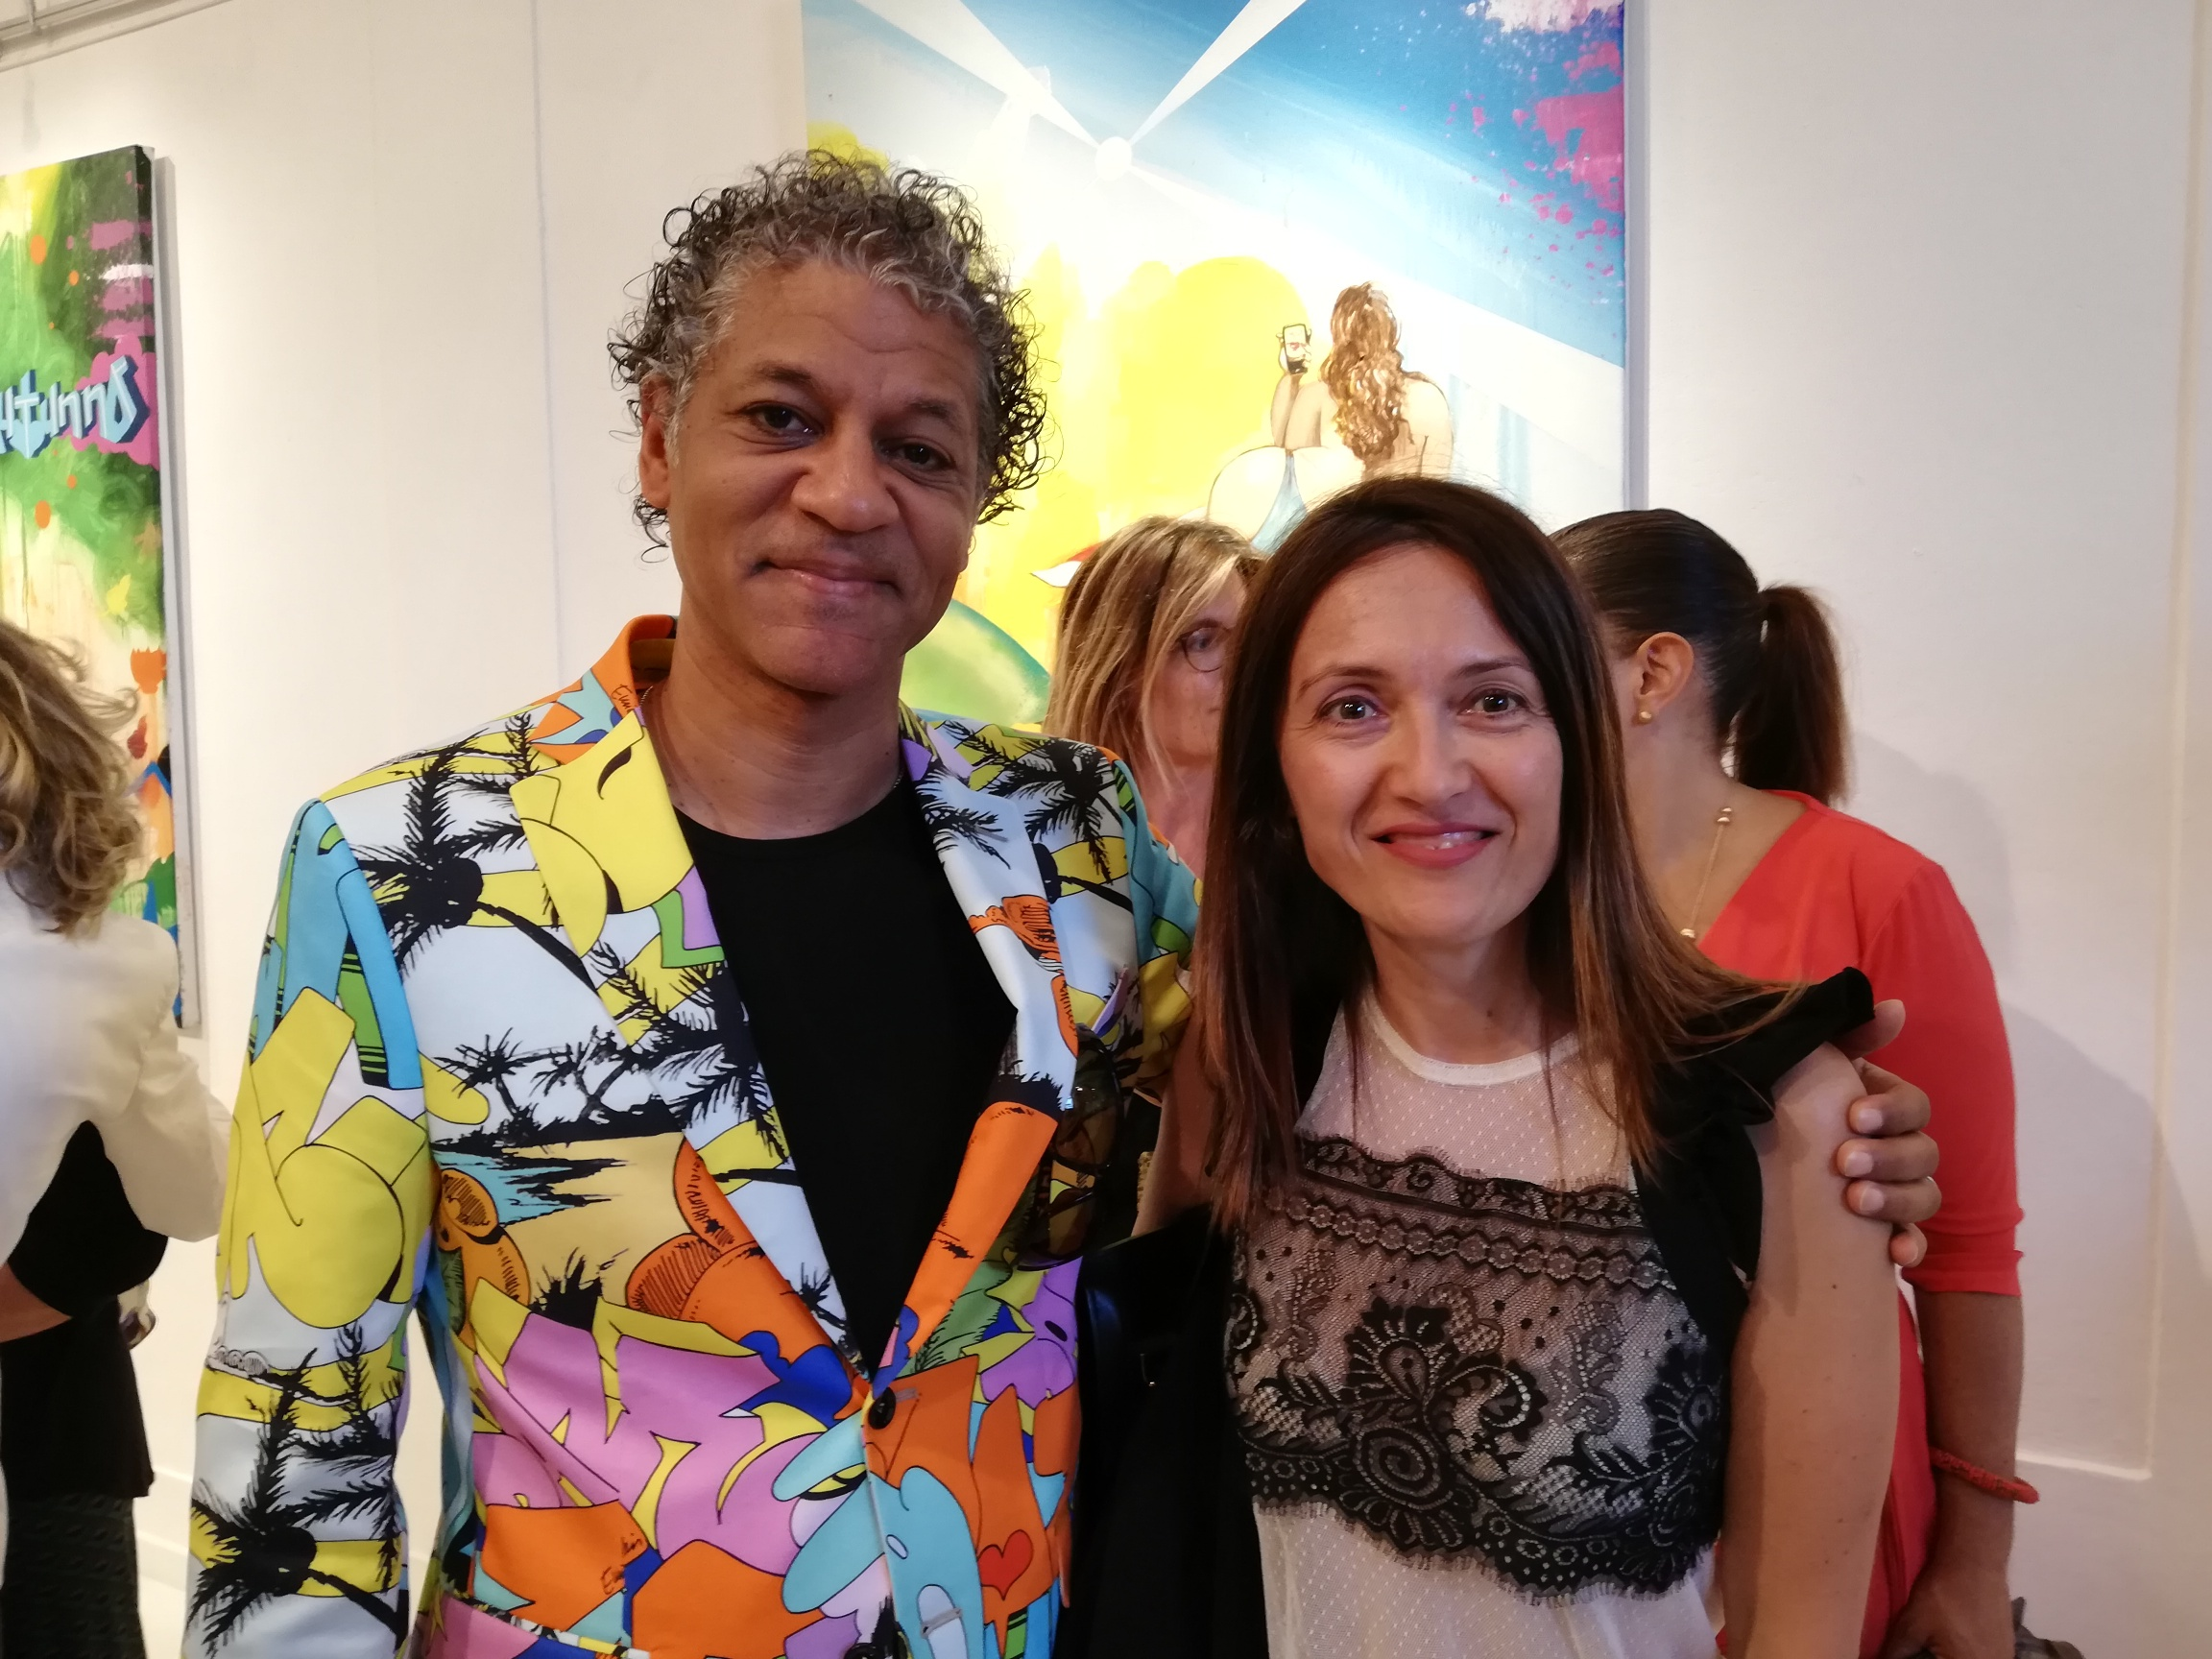 MyWhere con l'artista Daze